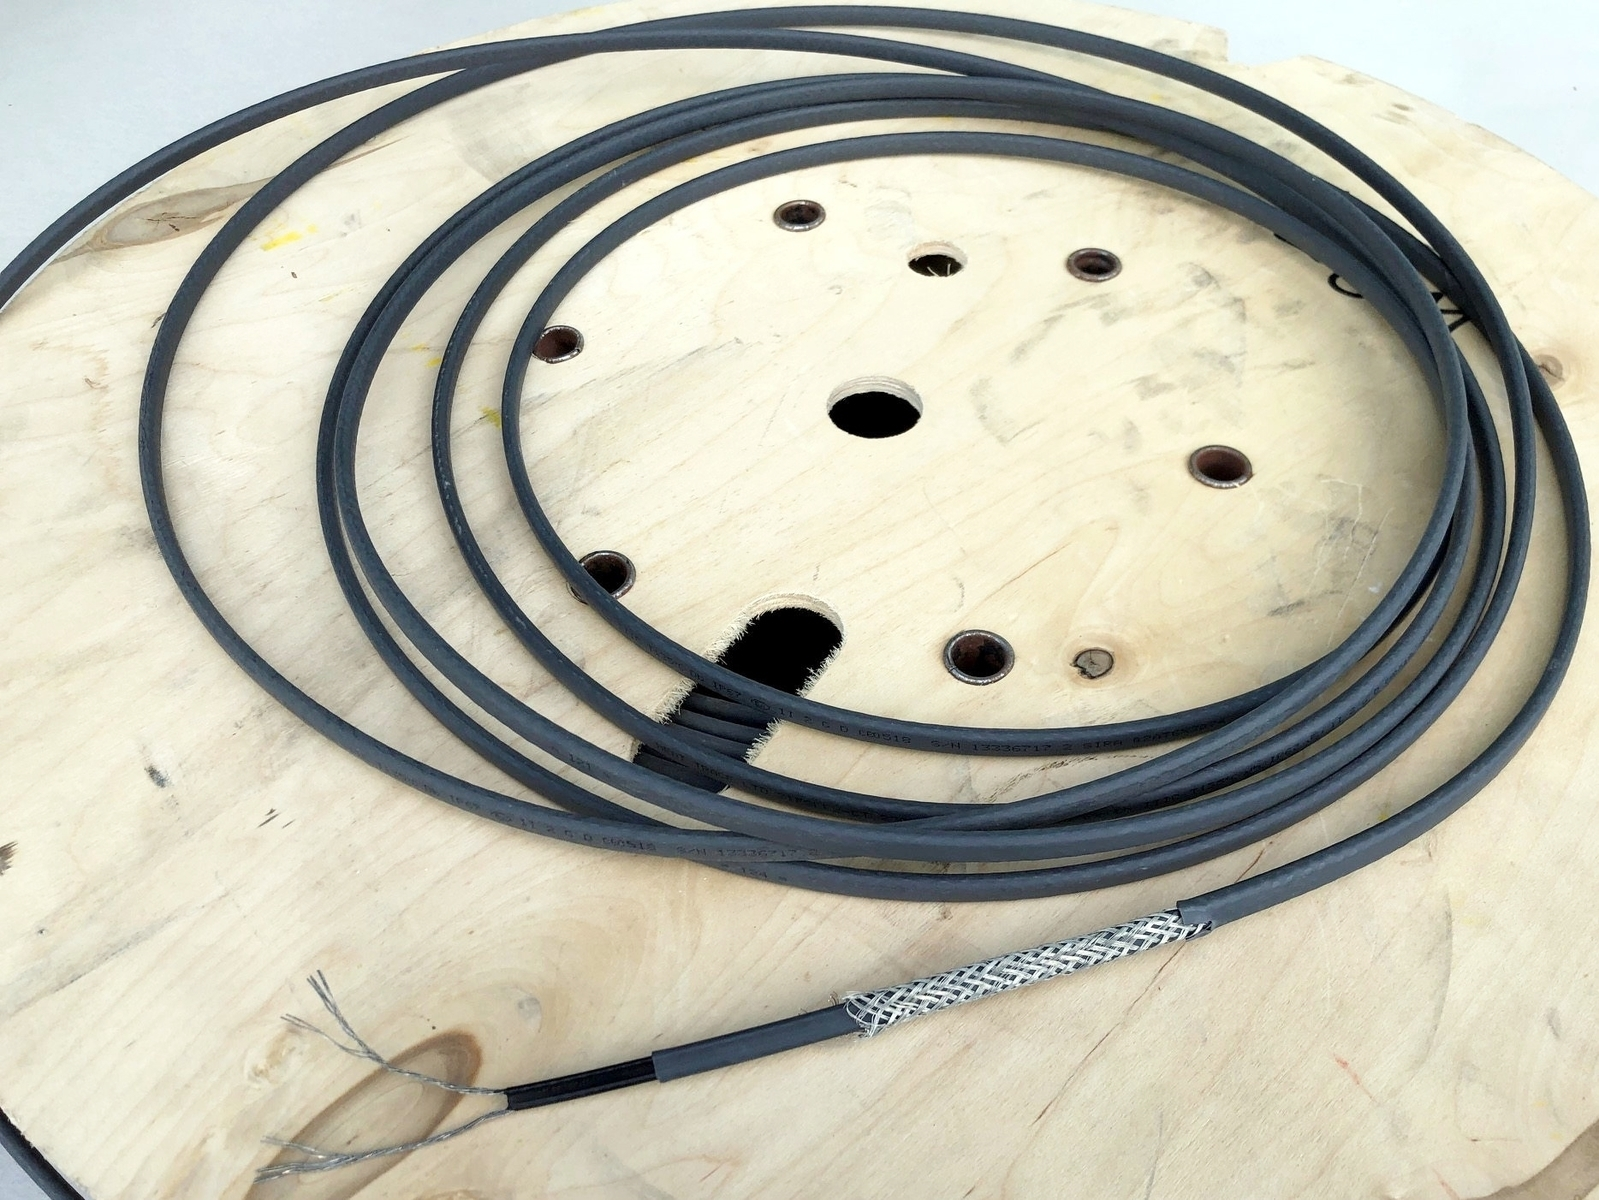 Isereguleeruv küttekaabel 31FSLE2-CT, 31 W/m, 230V, Heat Trace Ltd